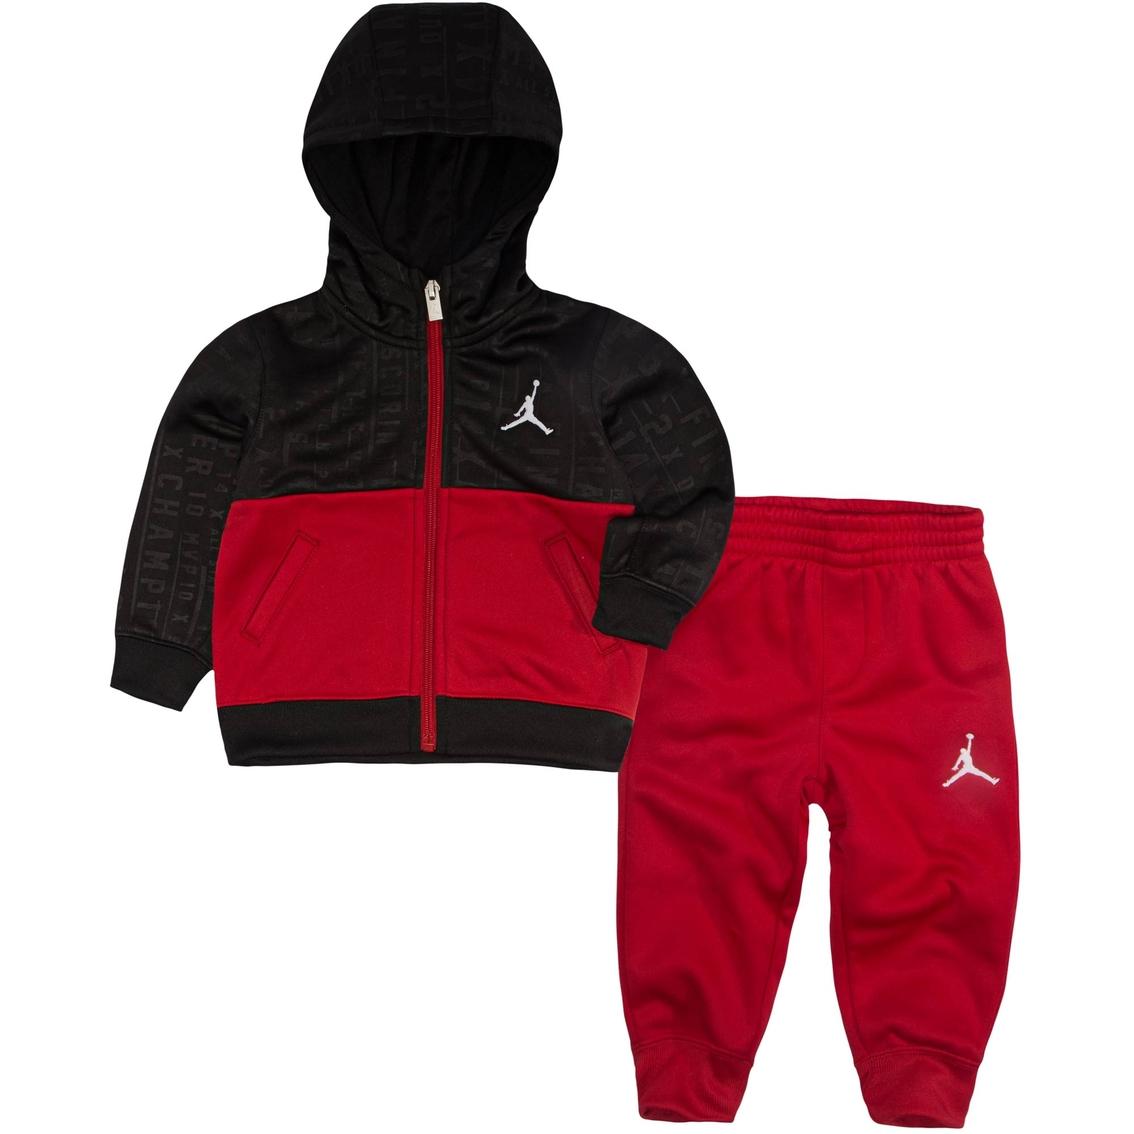 ab8a89054975 Jordan Toddler Boys 2 Pc. Vertical Aop Therma Fleece Hoodie And Pant ...